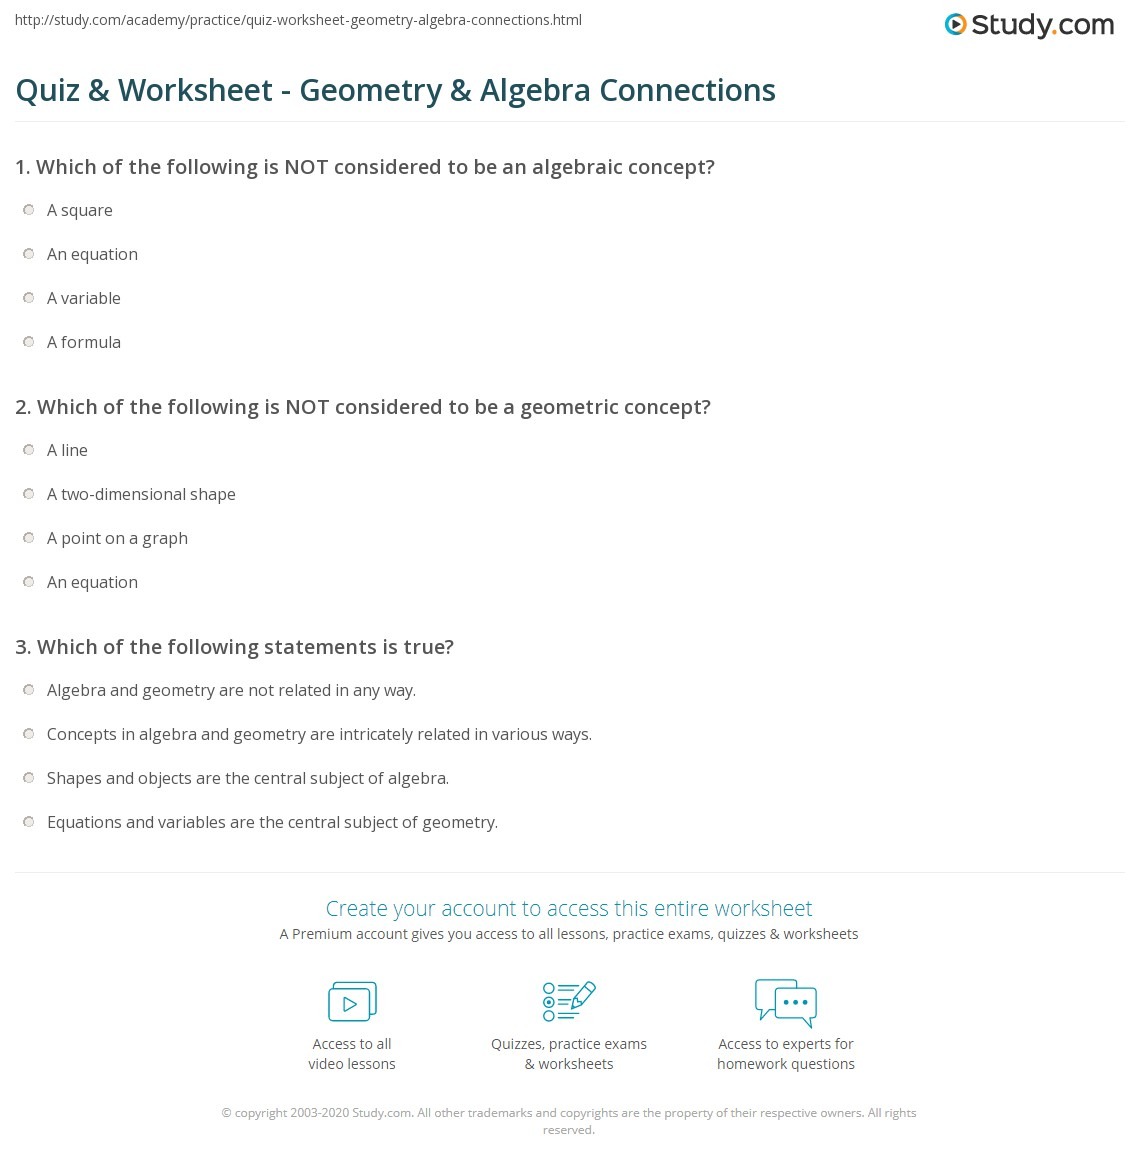 Quiz & Worksheet - Geometry & Algebra Connections | Study.com